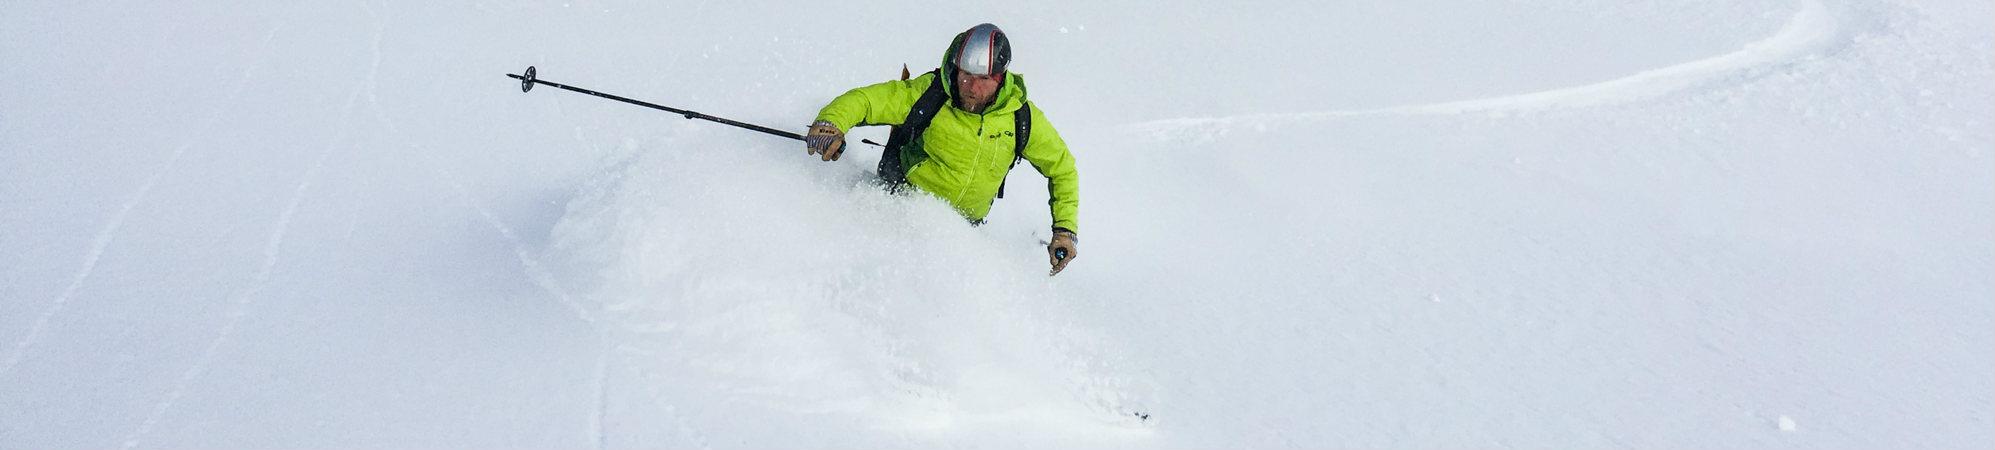 skiing with Jeff Witt